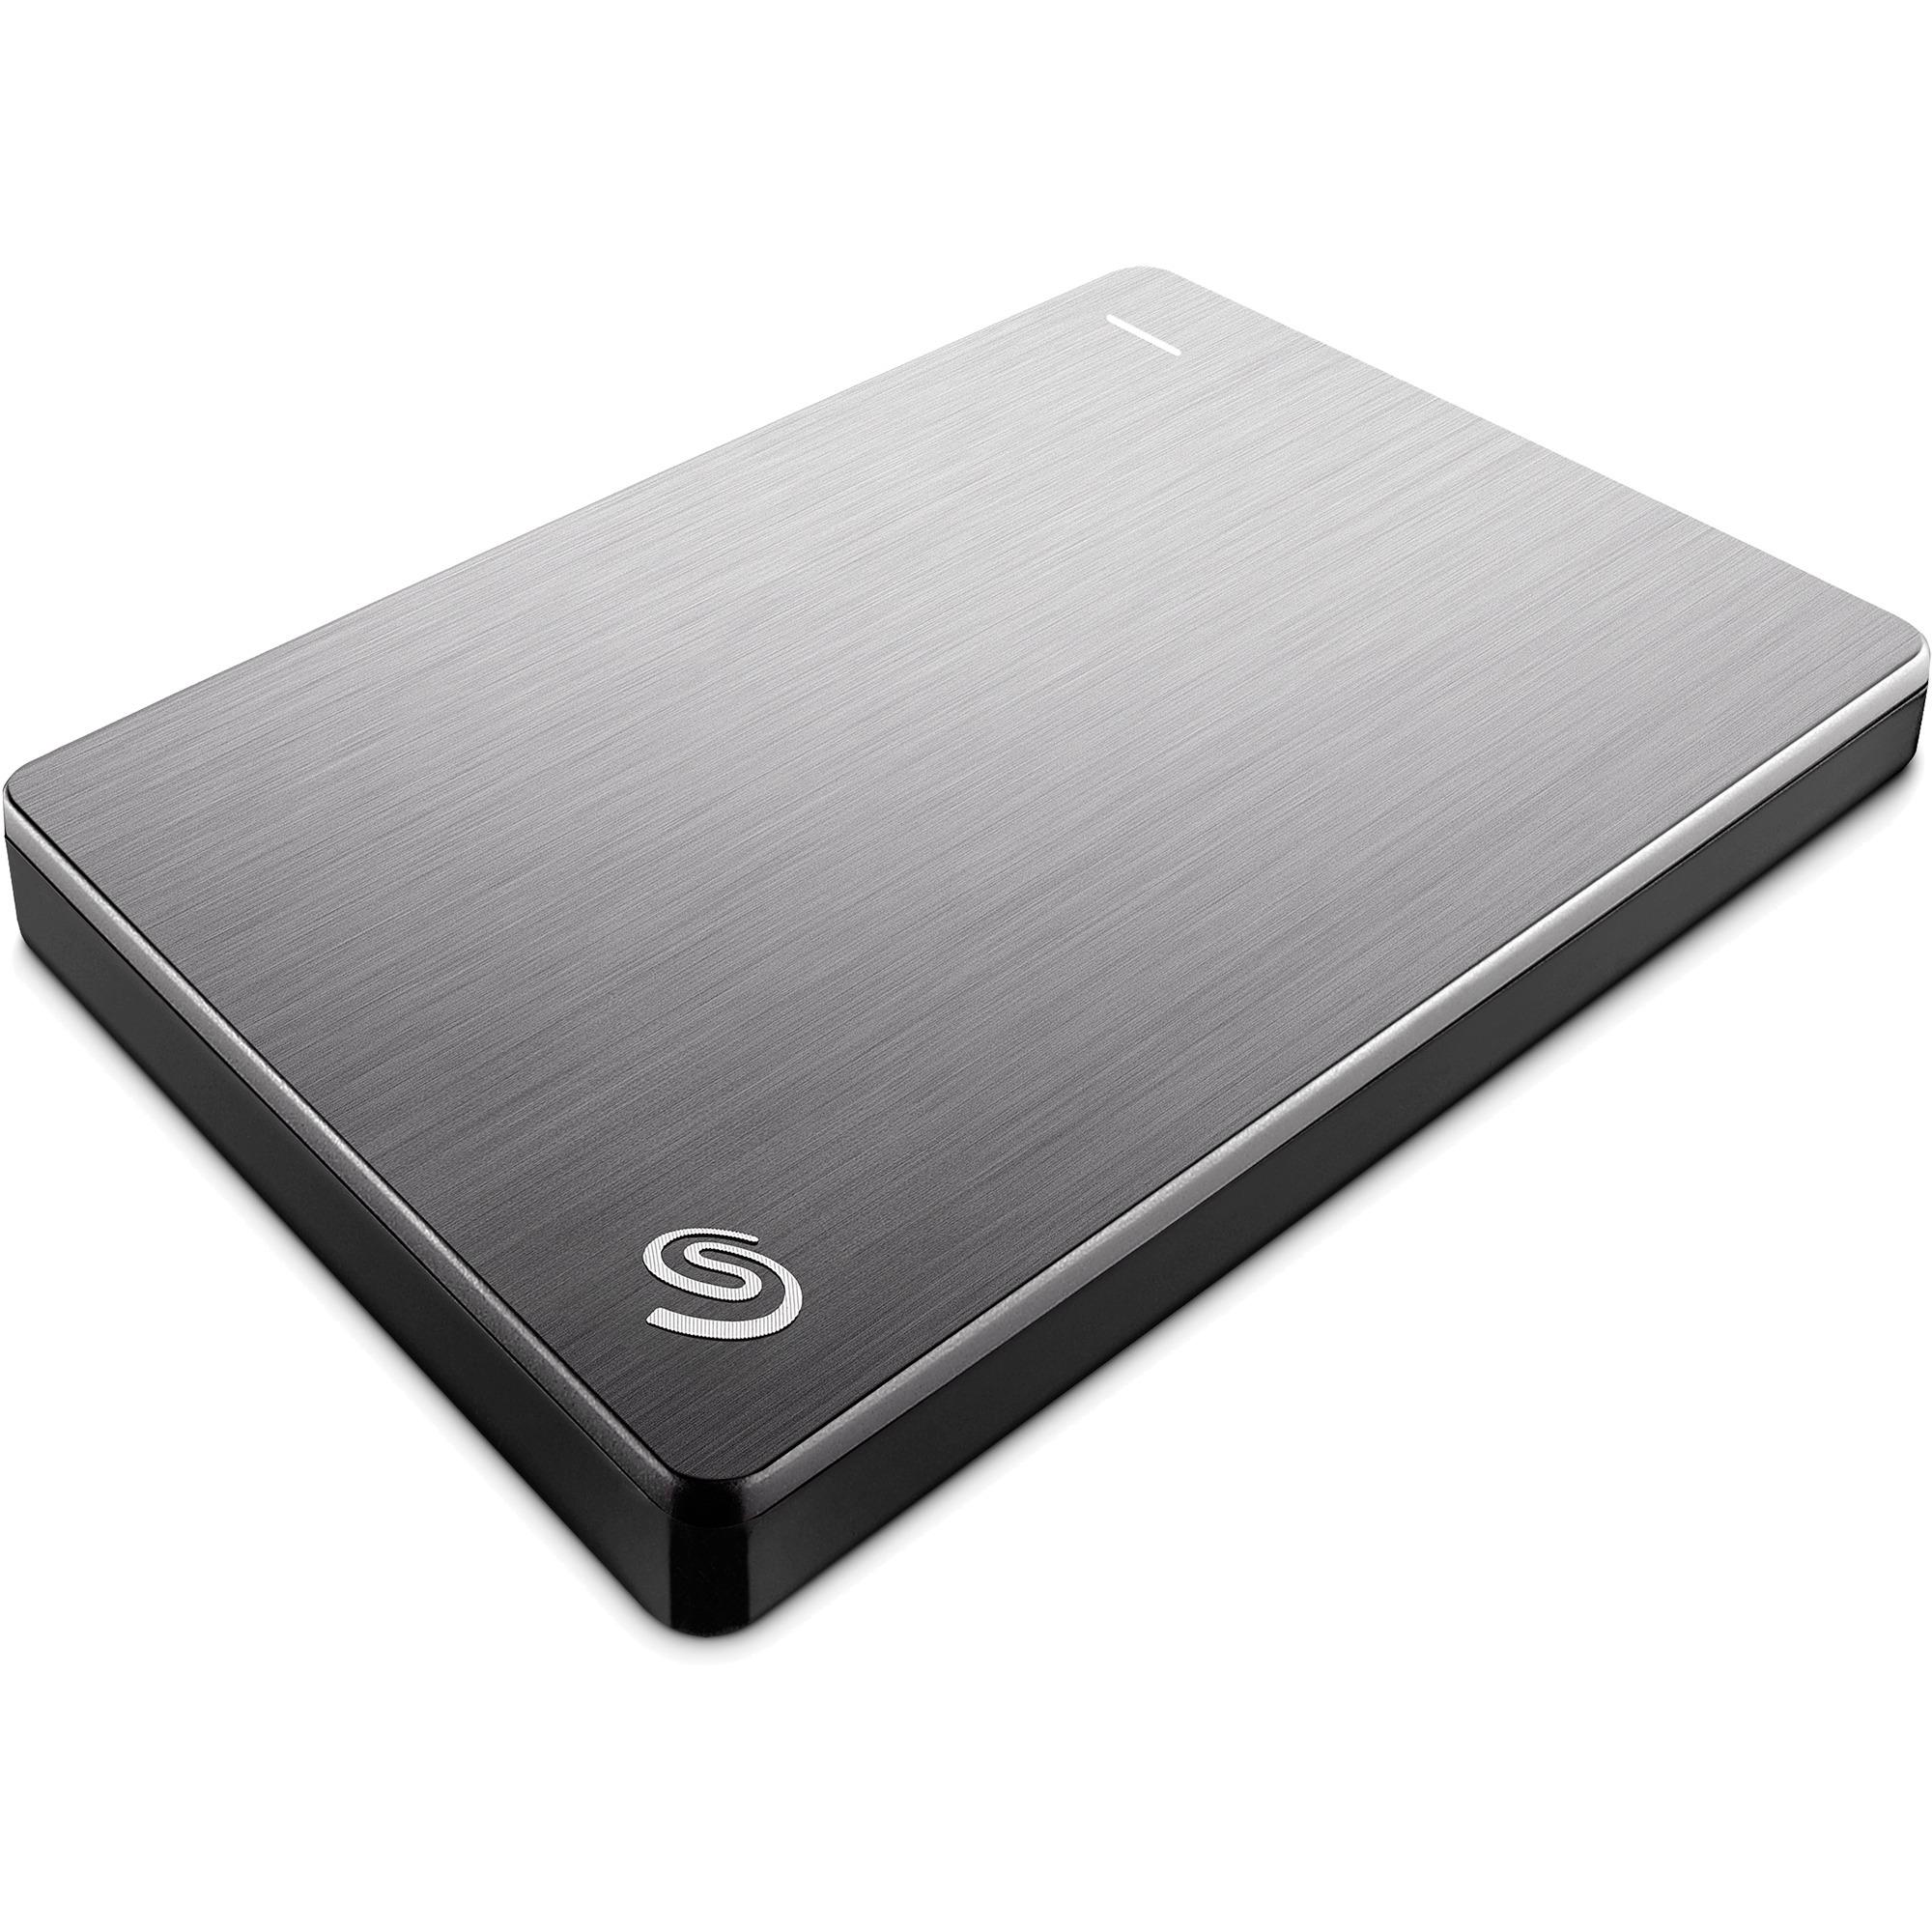 Backup Plus Slim 1TB disco duro externo 1000 GB Plata, Unidad de disco duro